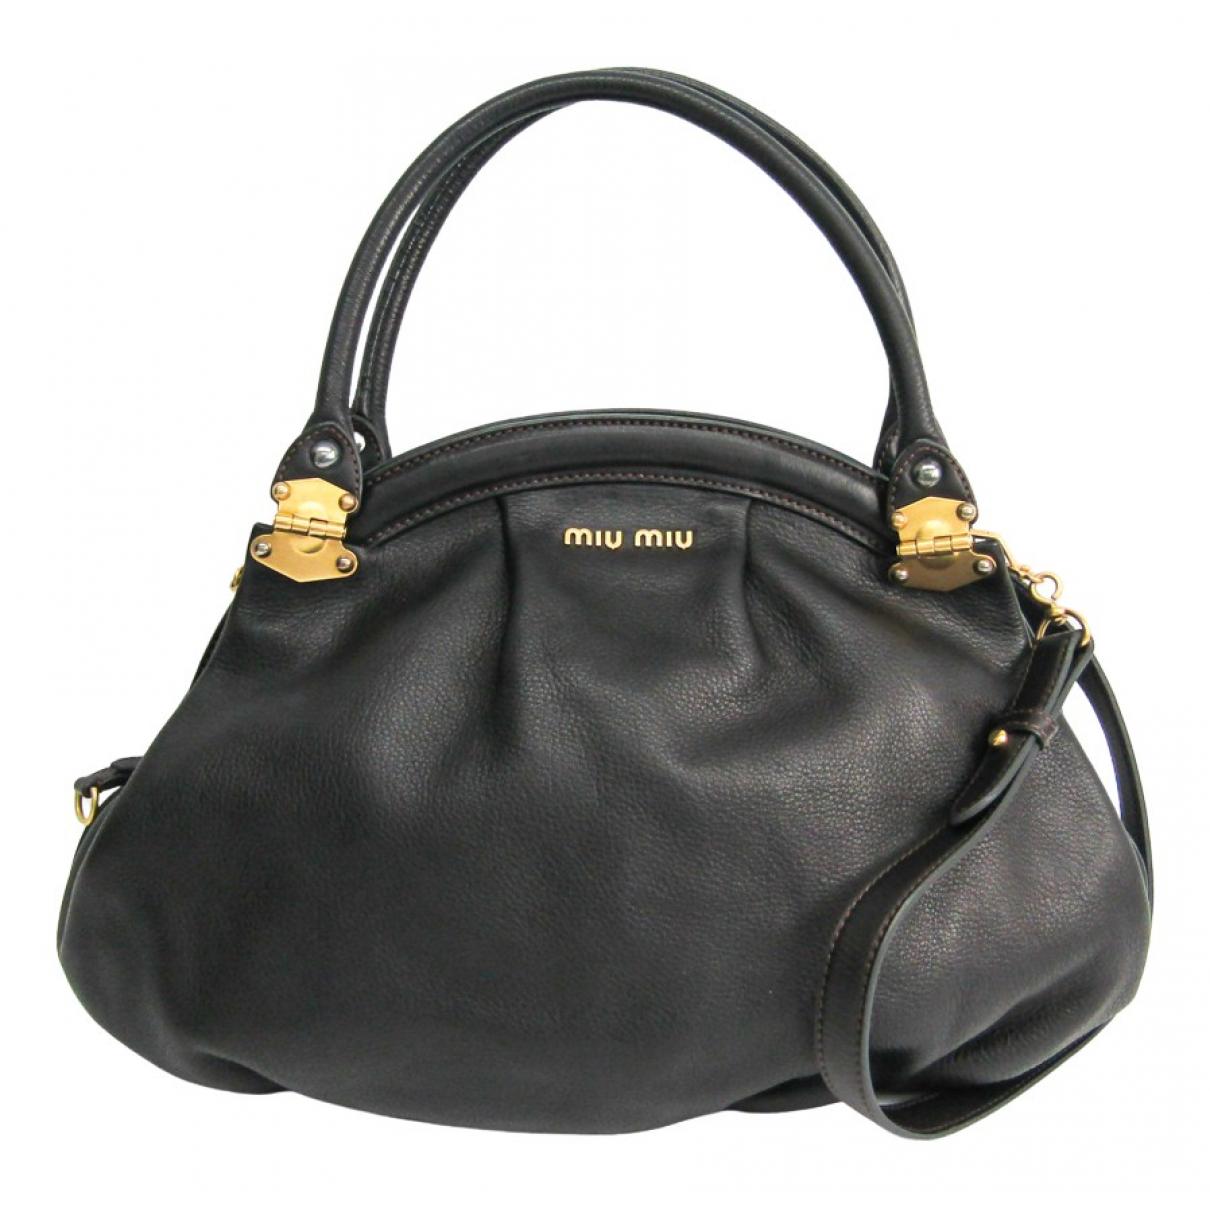 Miu Miu N Black Leather handbag for Women N